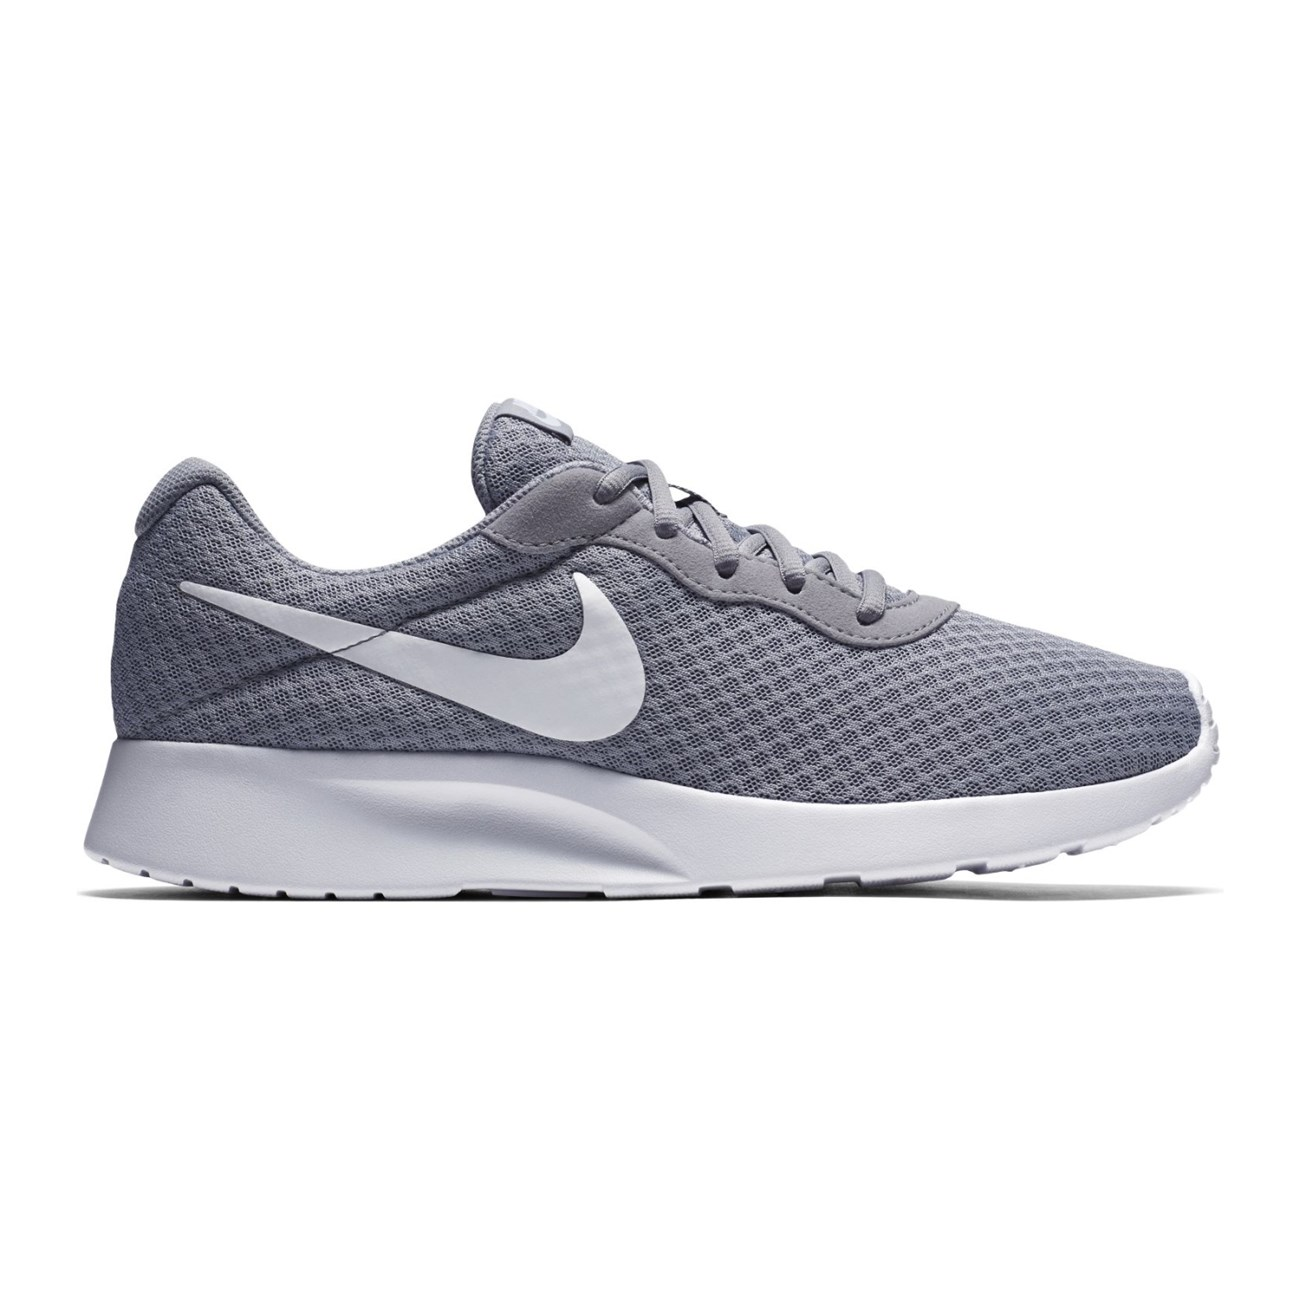 55950269f7e NIKE TANJUN < Sportstyle Παπούτσια | INTERSPORT